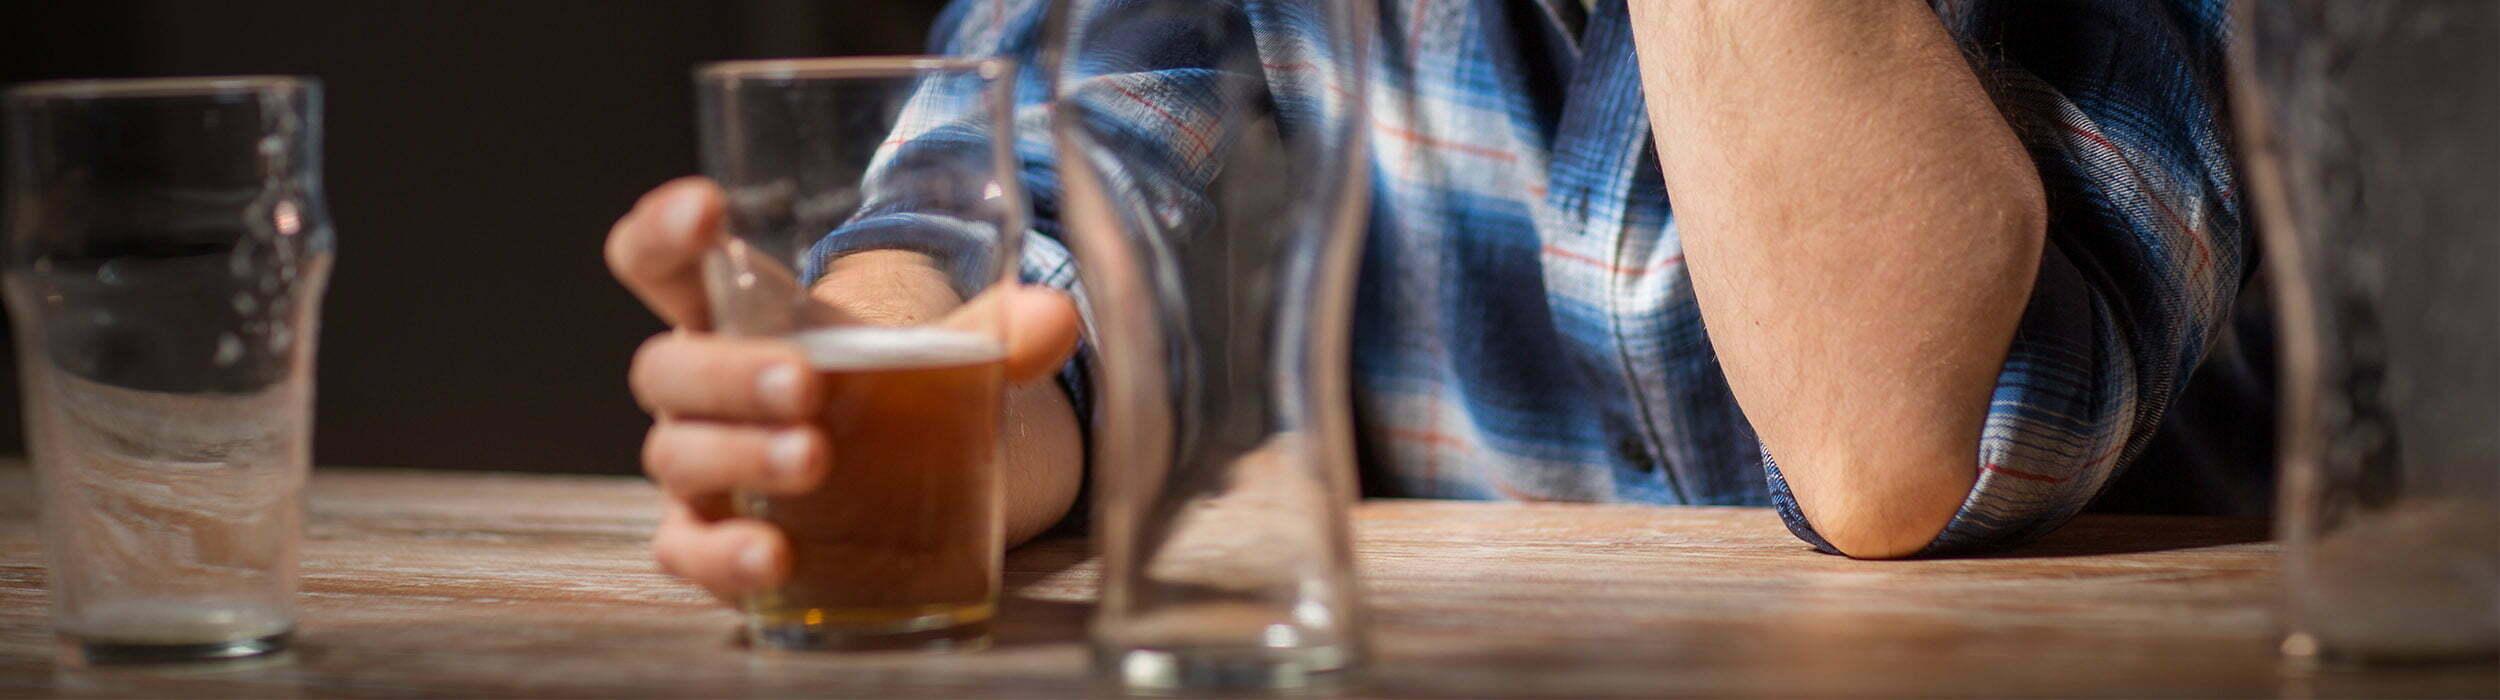 dependenta de alcool banner